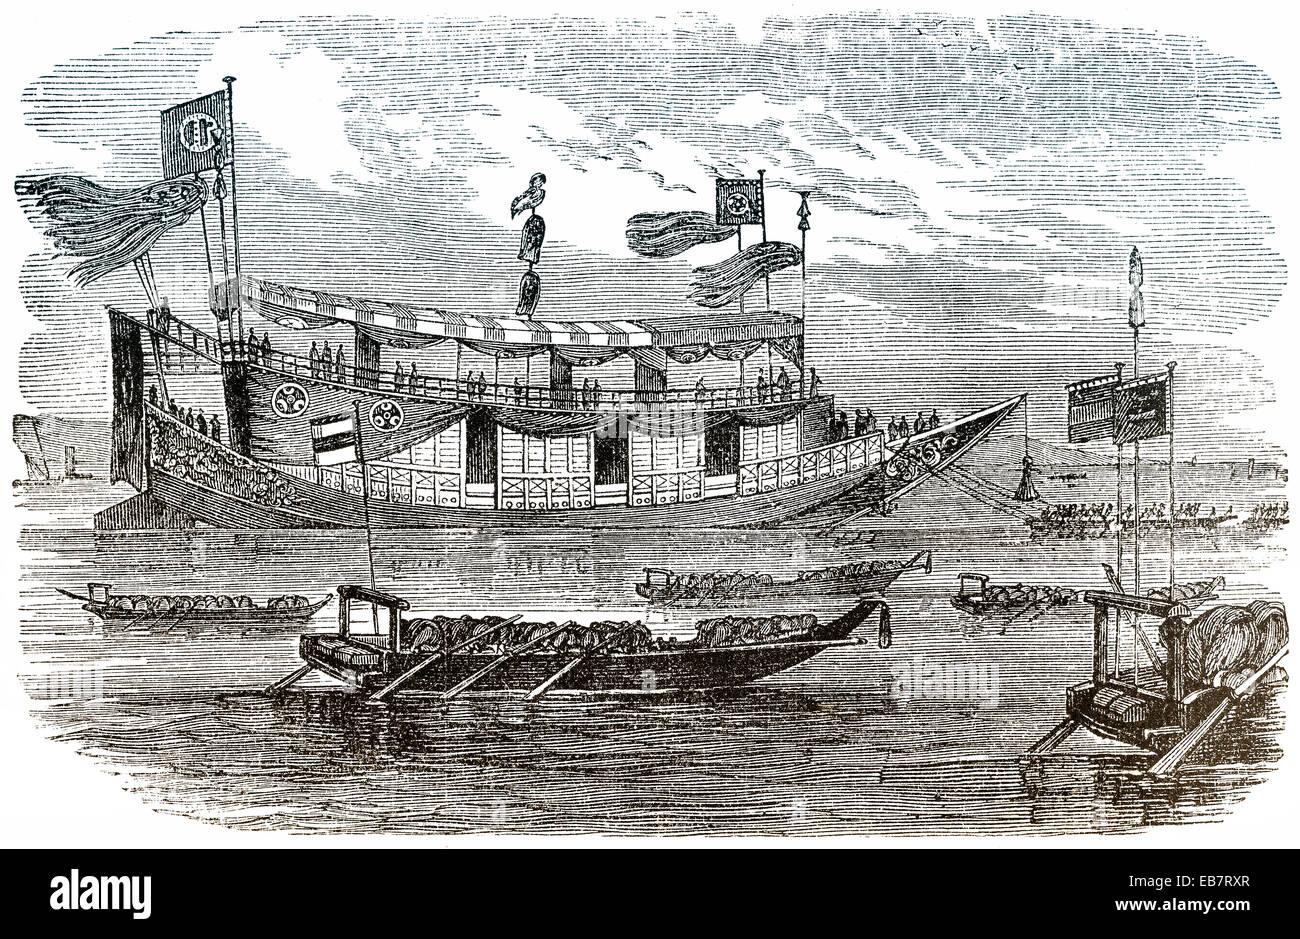 japanese royal barge, japanische königliche Barke - Stock Image